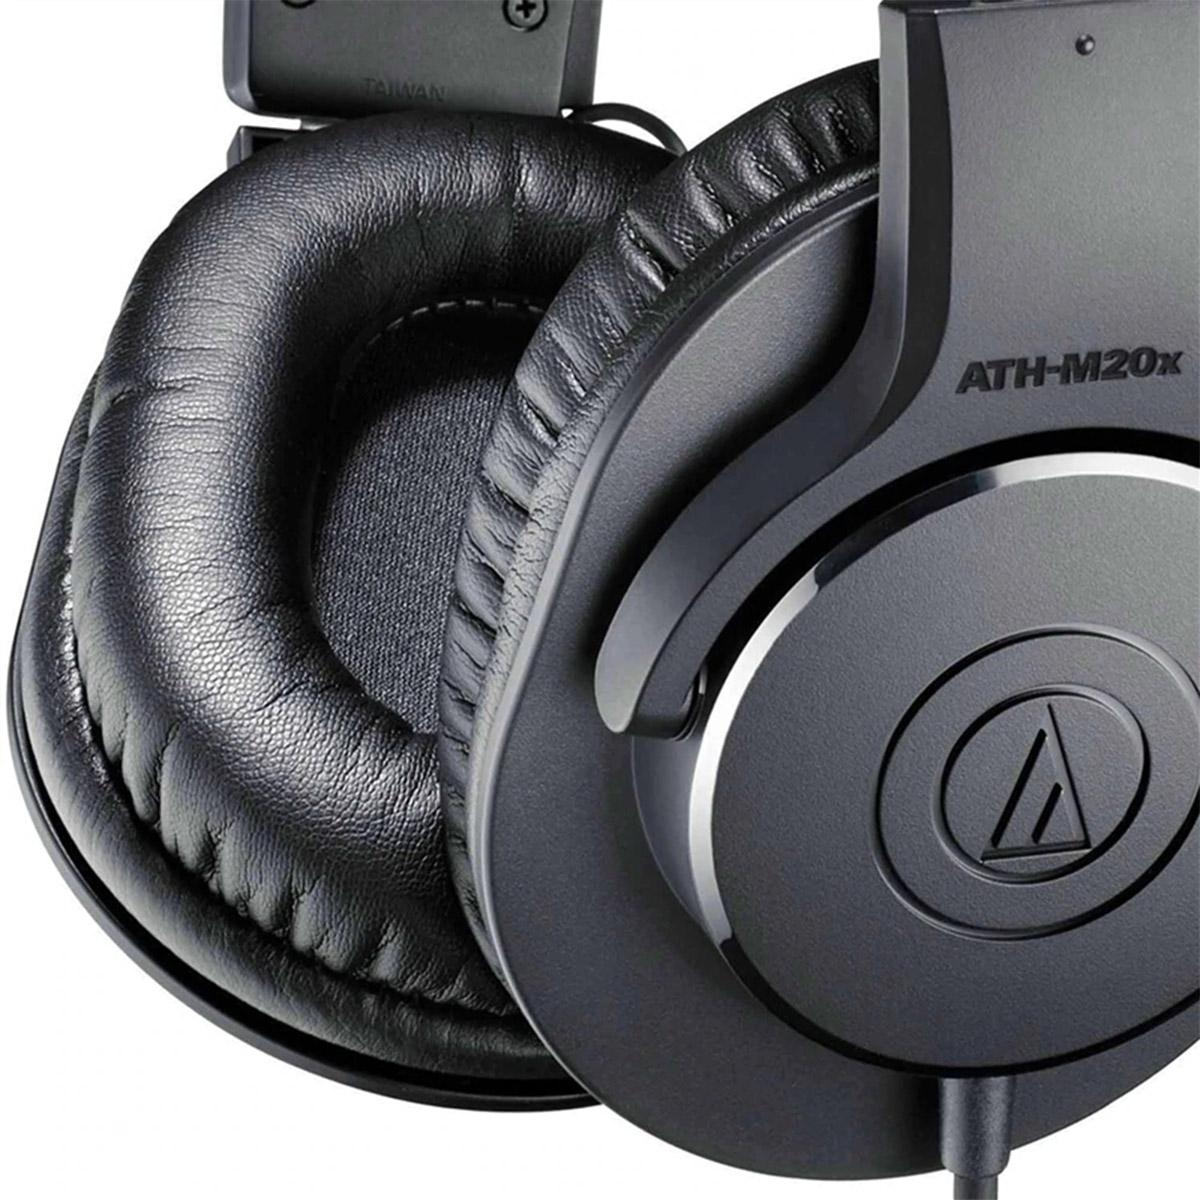 HEADPHONES AUDIO-TECHNICA ATH-M20X